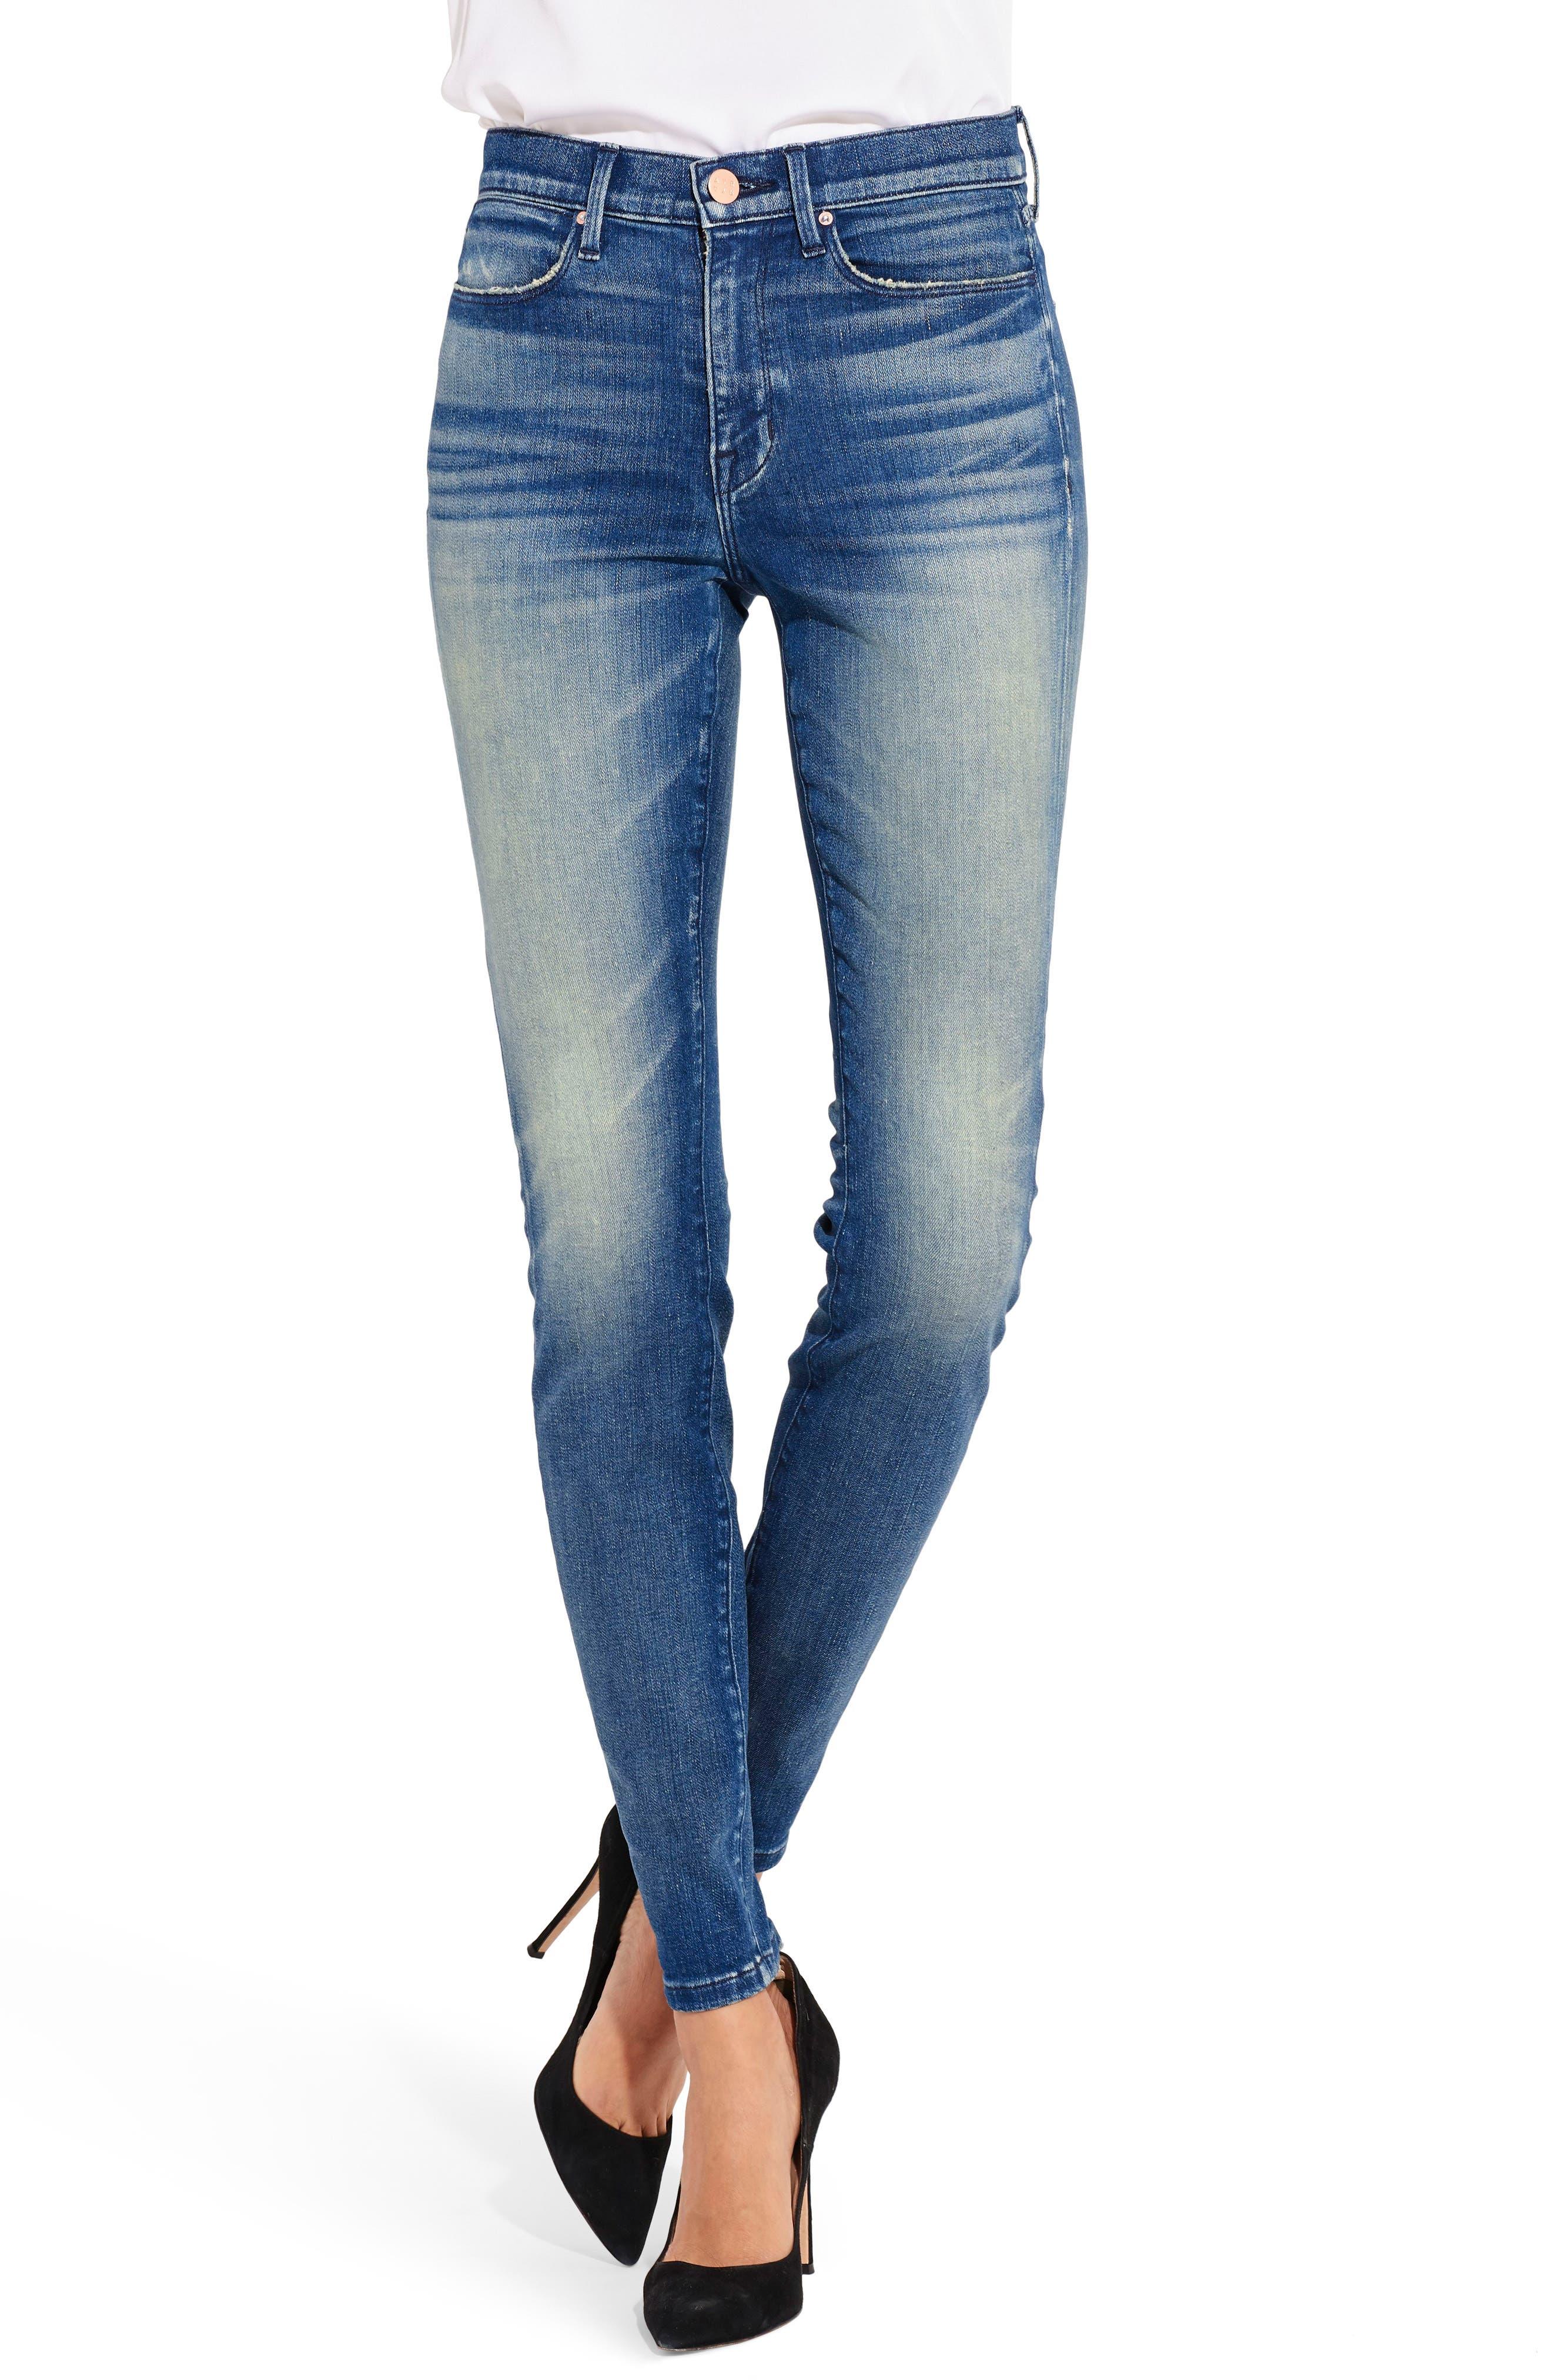 AYR The Skinny Jeans (Papas Fritas)